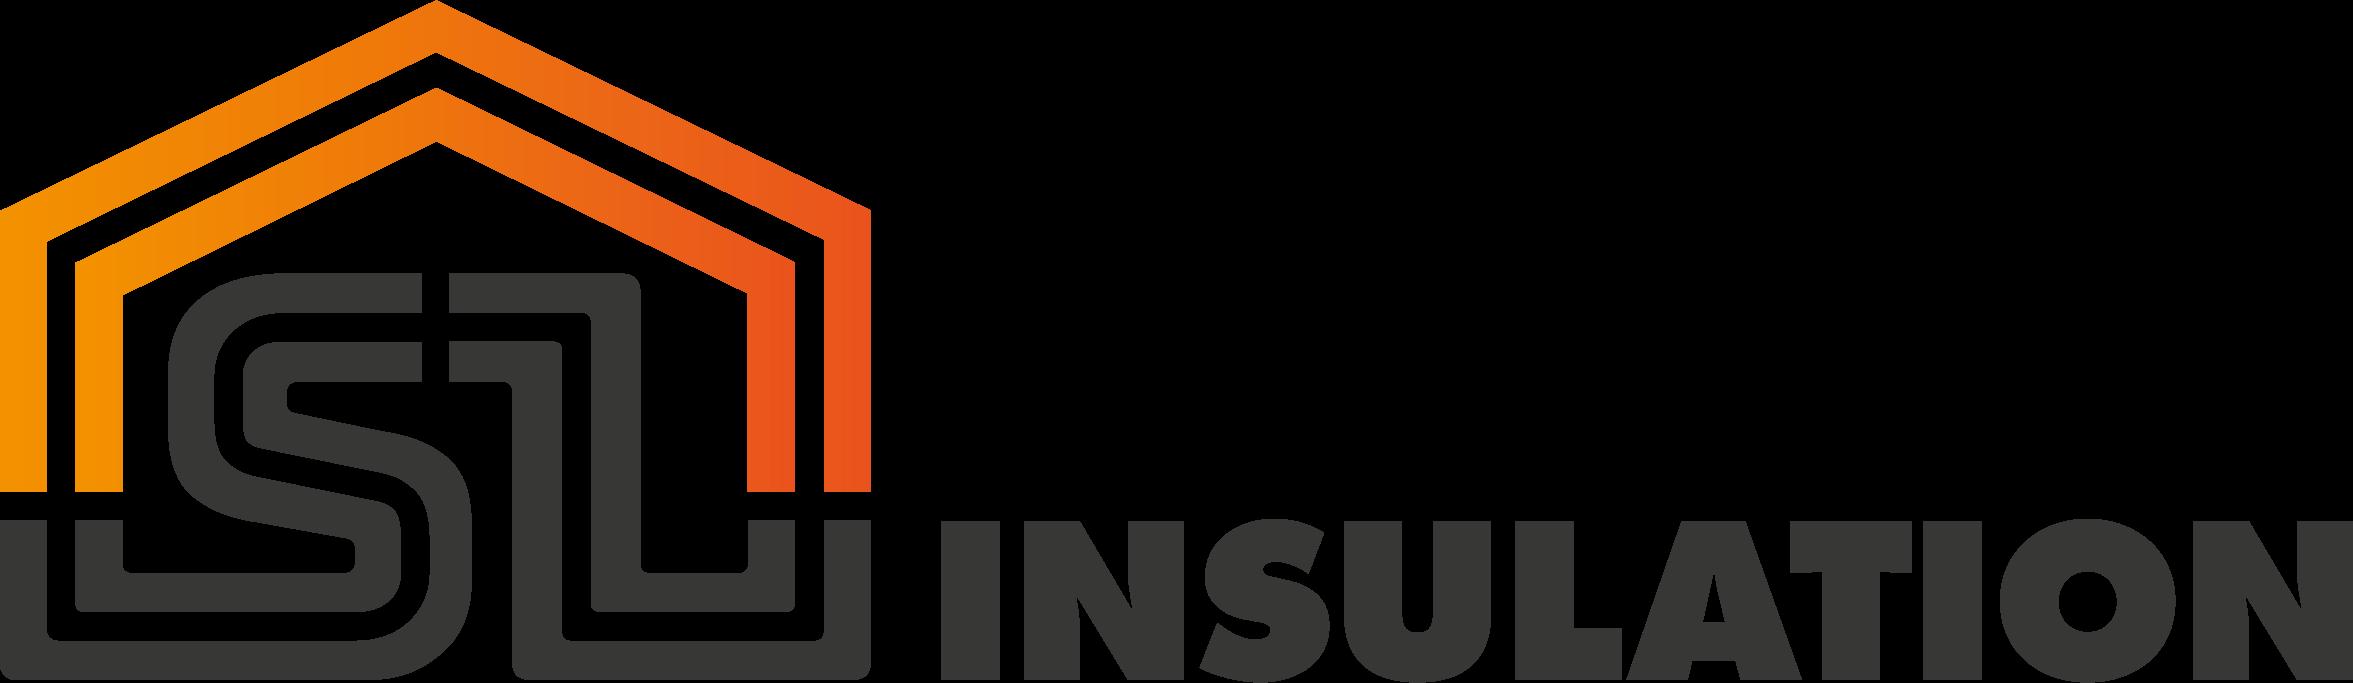 SL Insulation